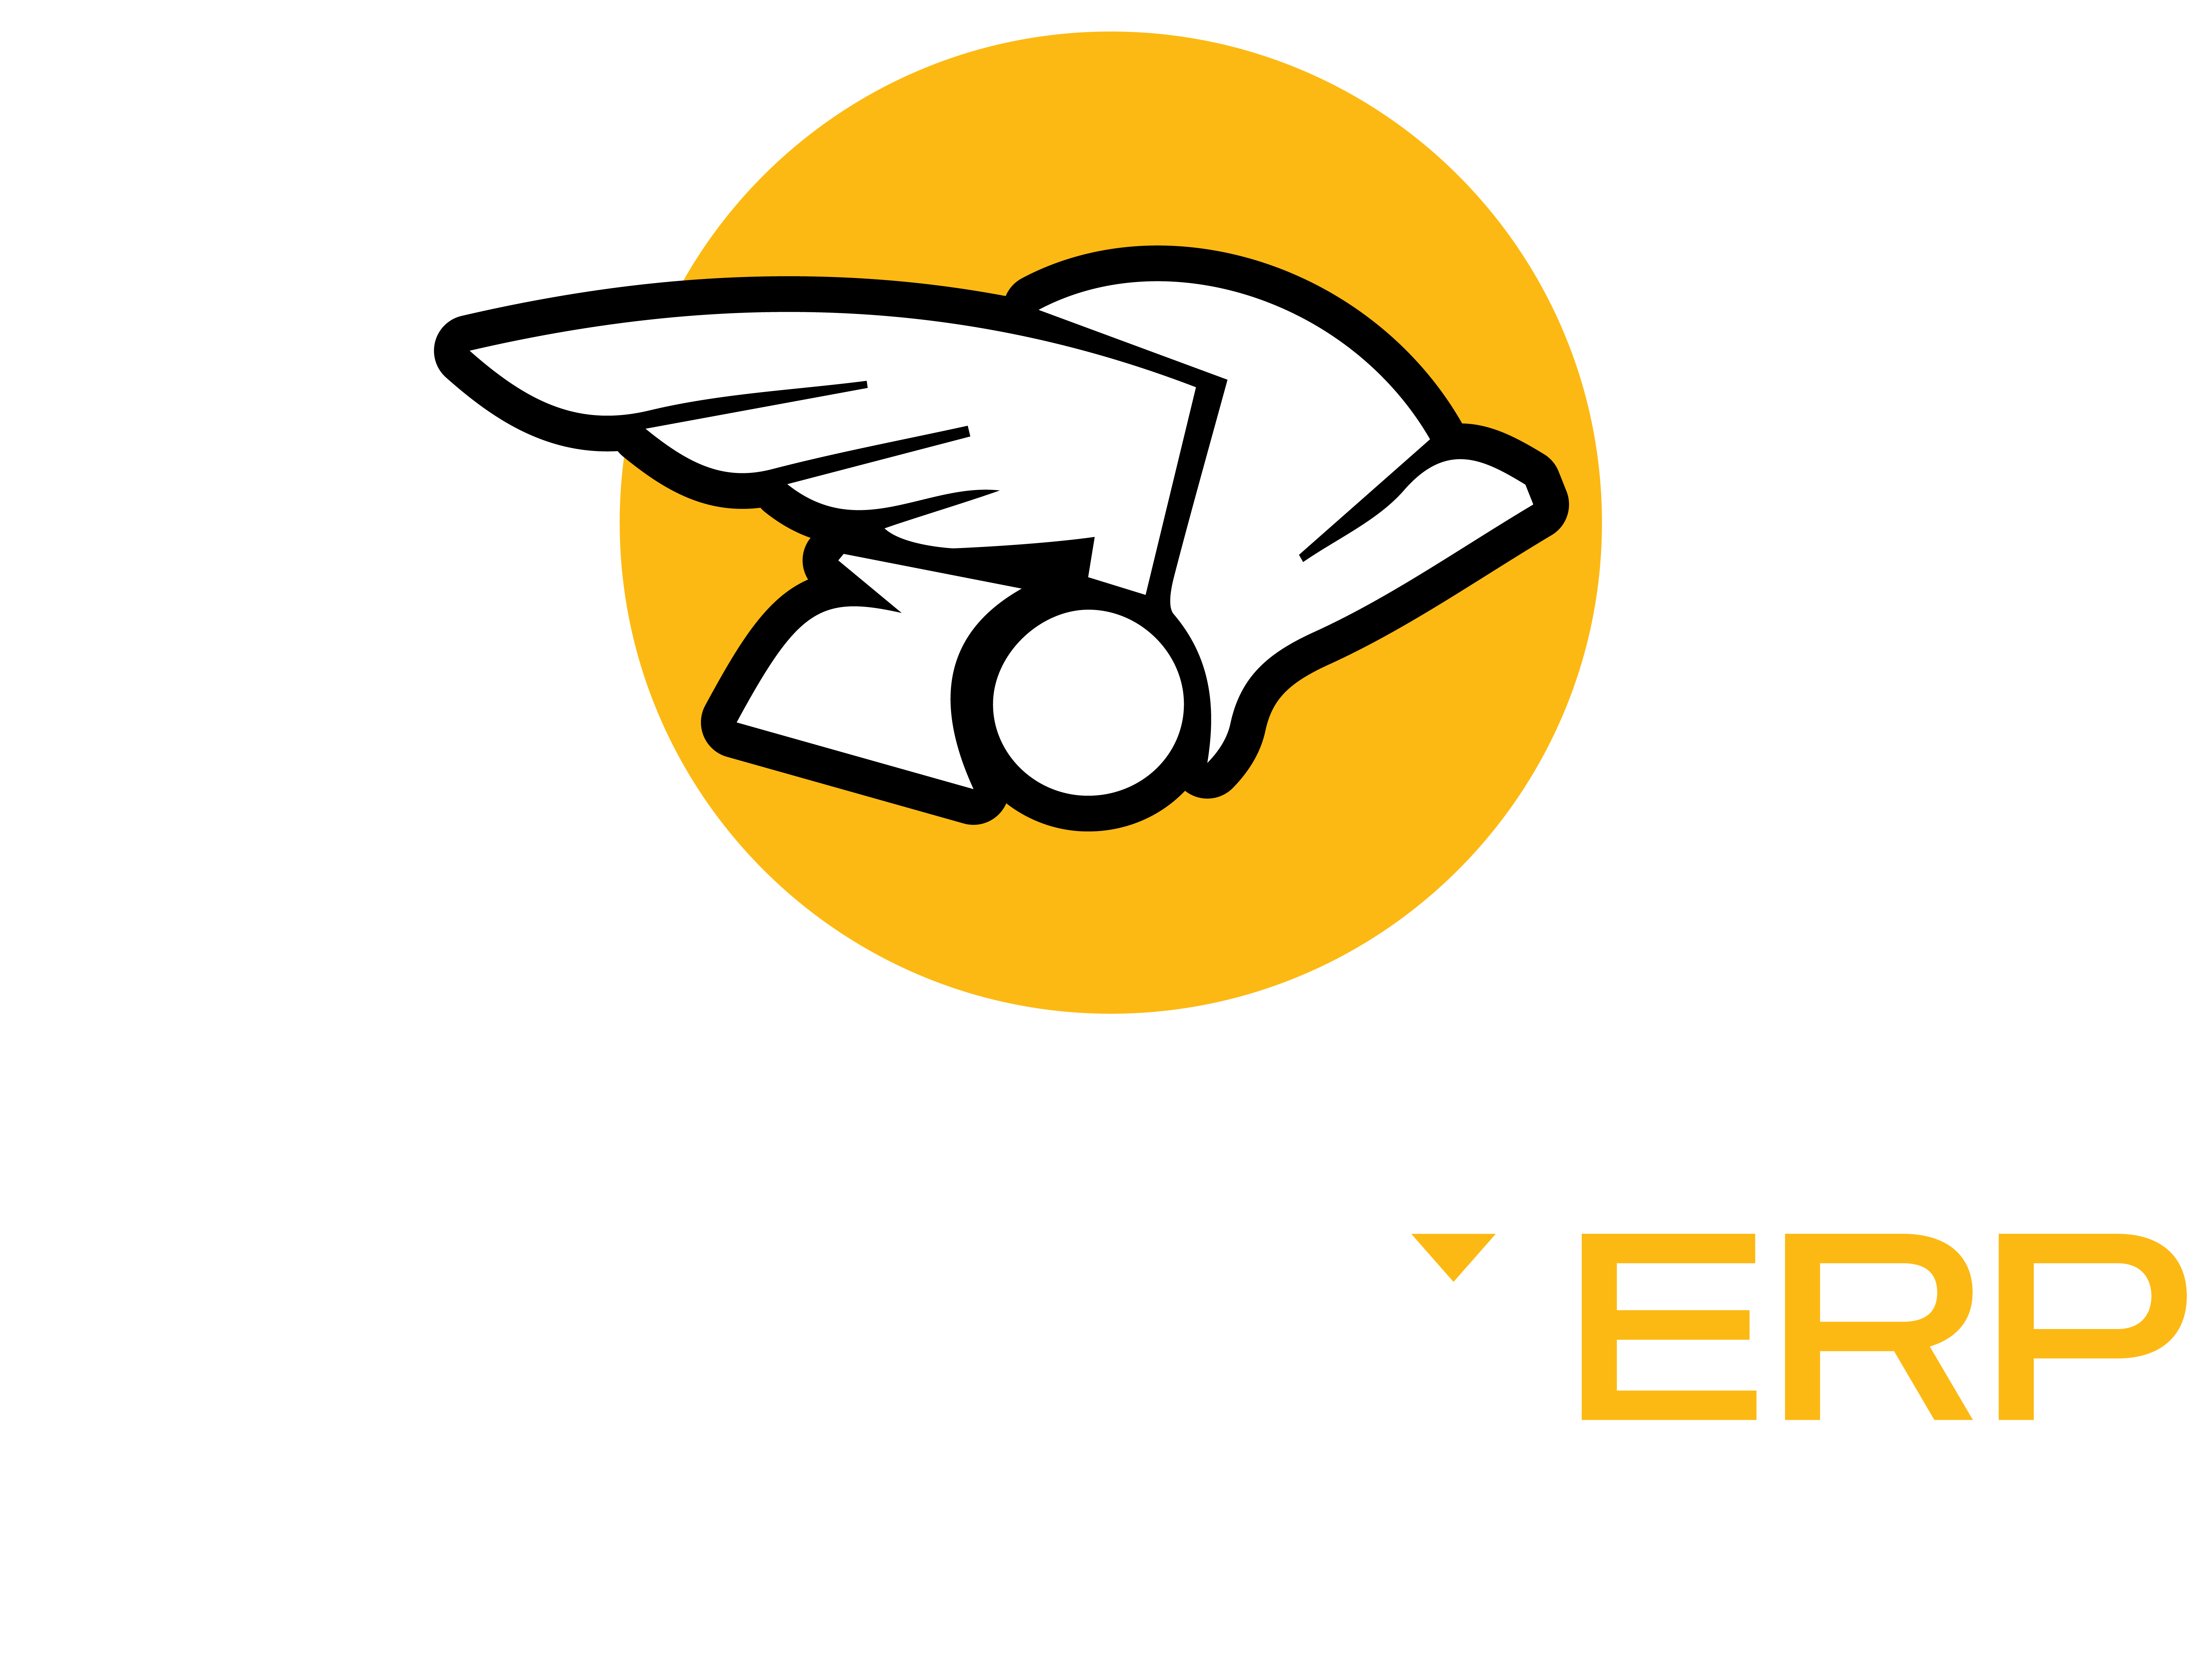 Mercury ERP